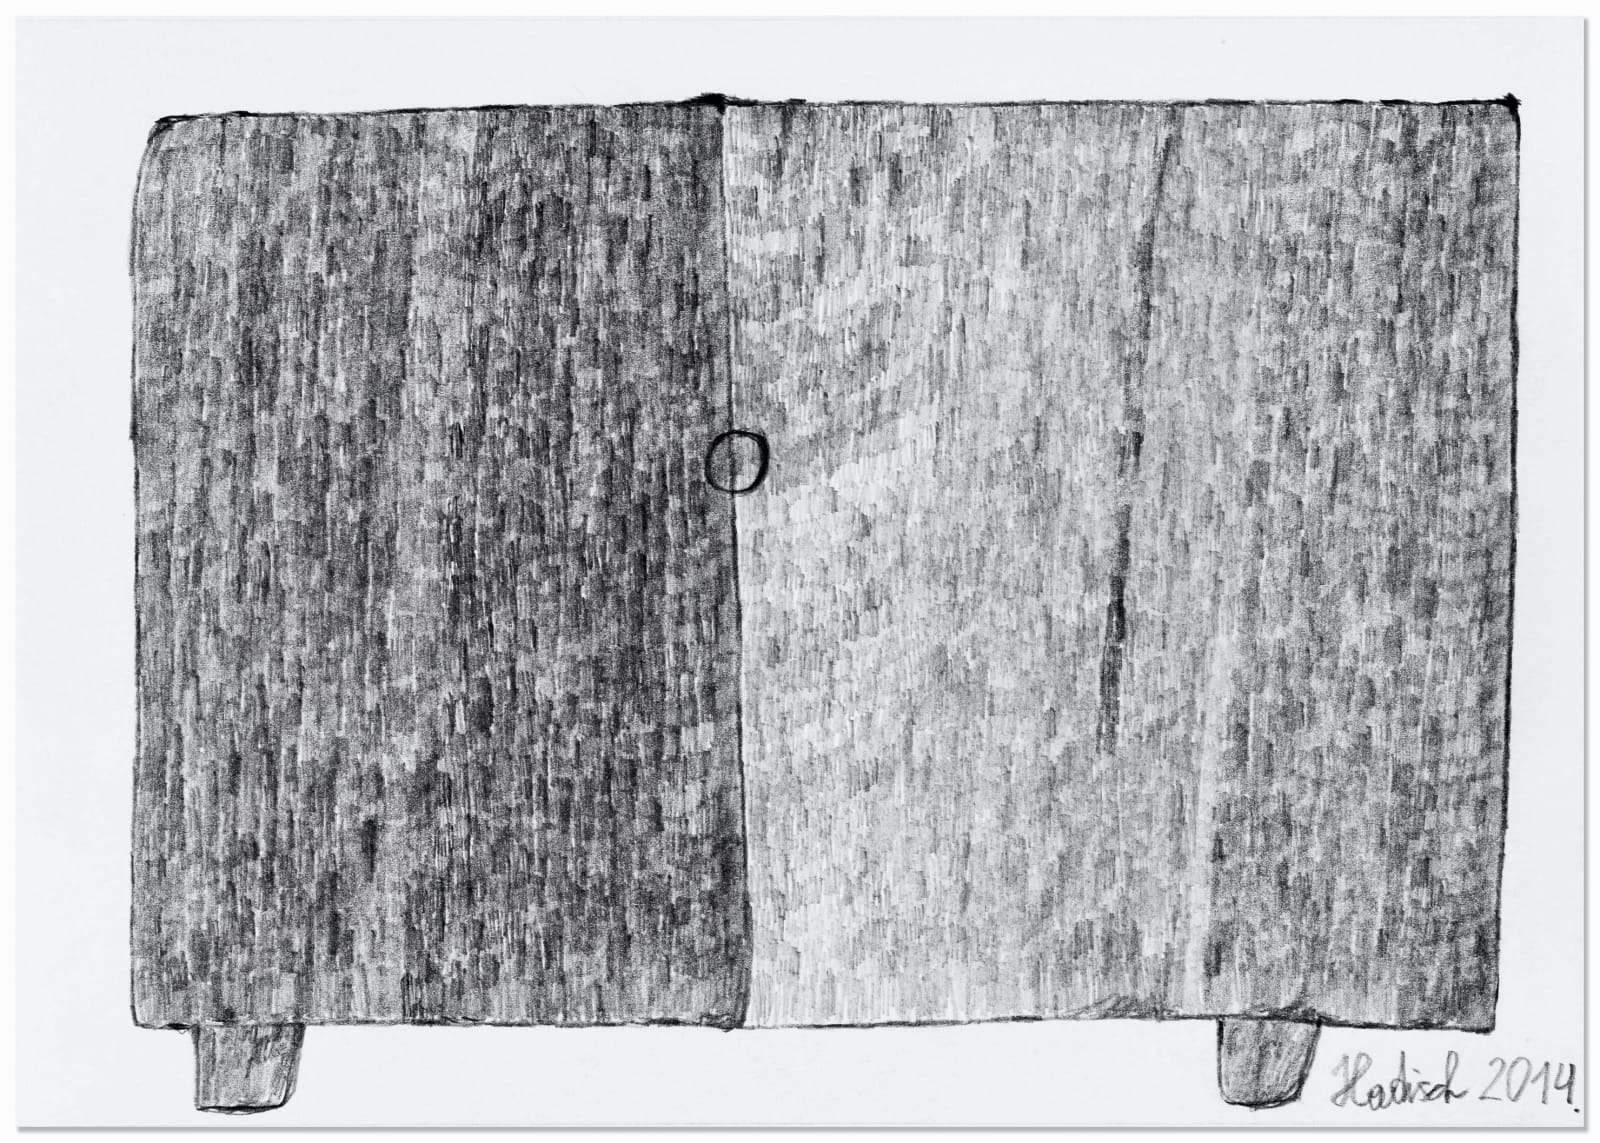 CUPBOARD, 2014 Graphite on paper 5.9 x 8.3 in. (14.9 x 21cm) HH 6 $1,800